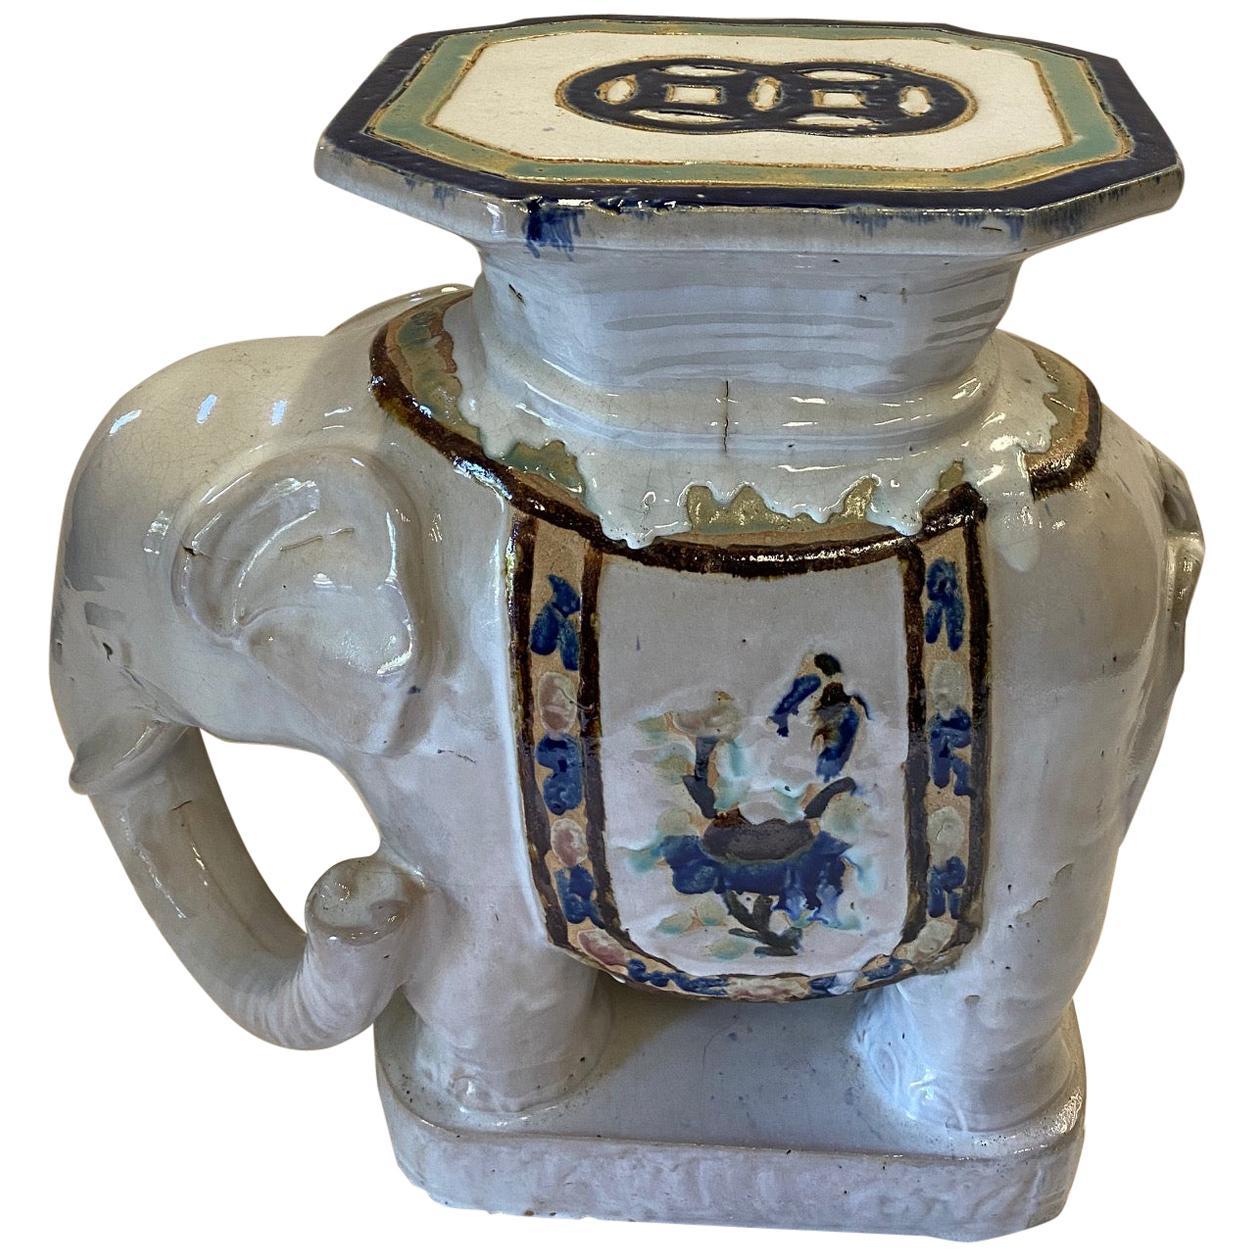 Vintage Ceramic Elephant Motife Garden Seat End Table